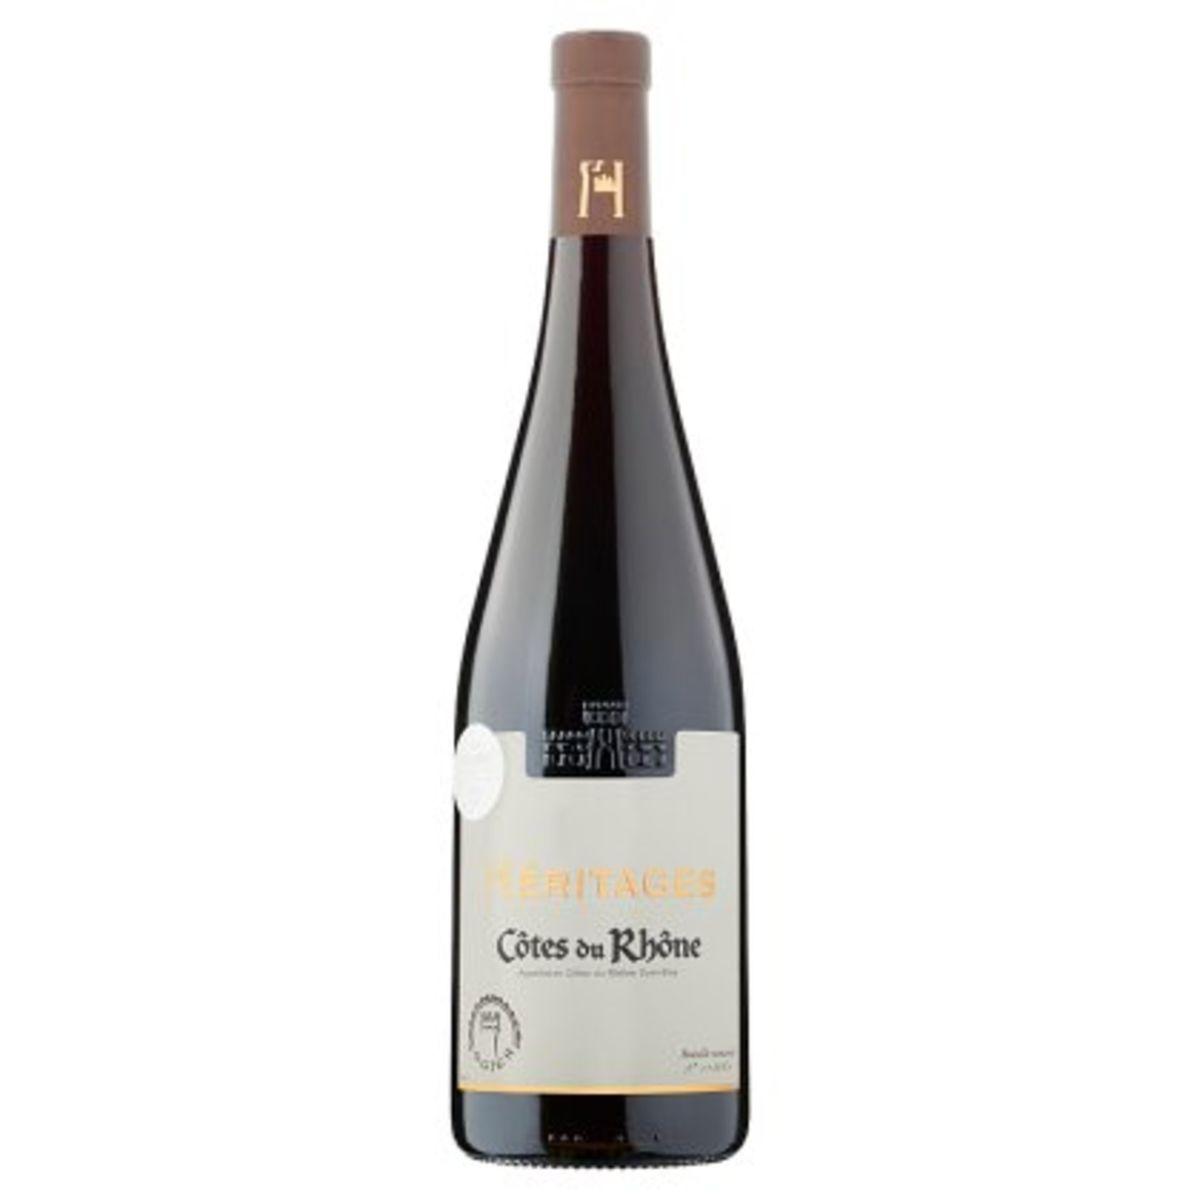 Ogier Héritages Côtes du Rhône 750 ml